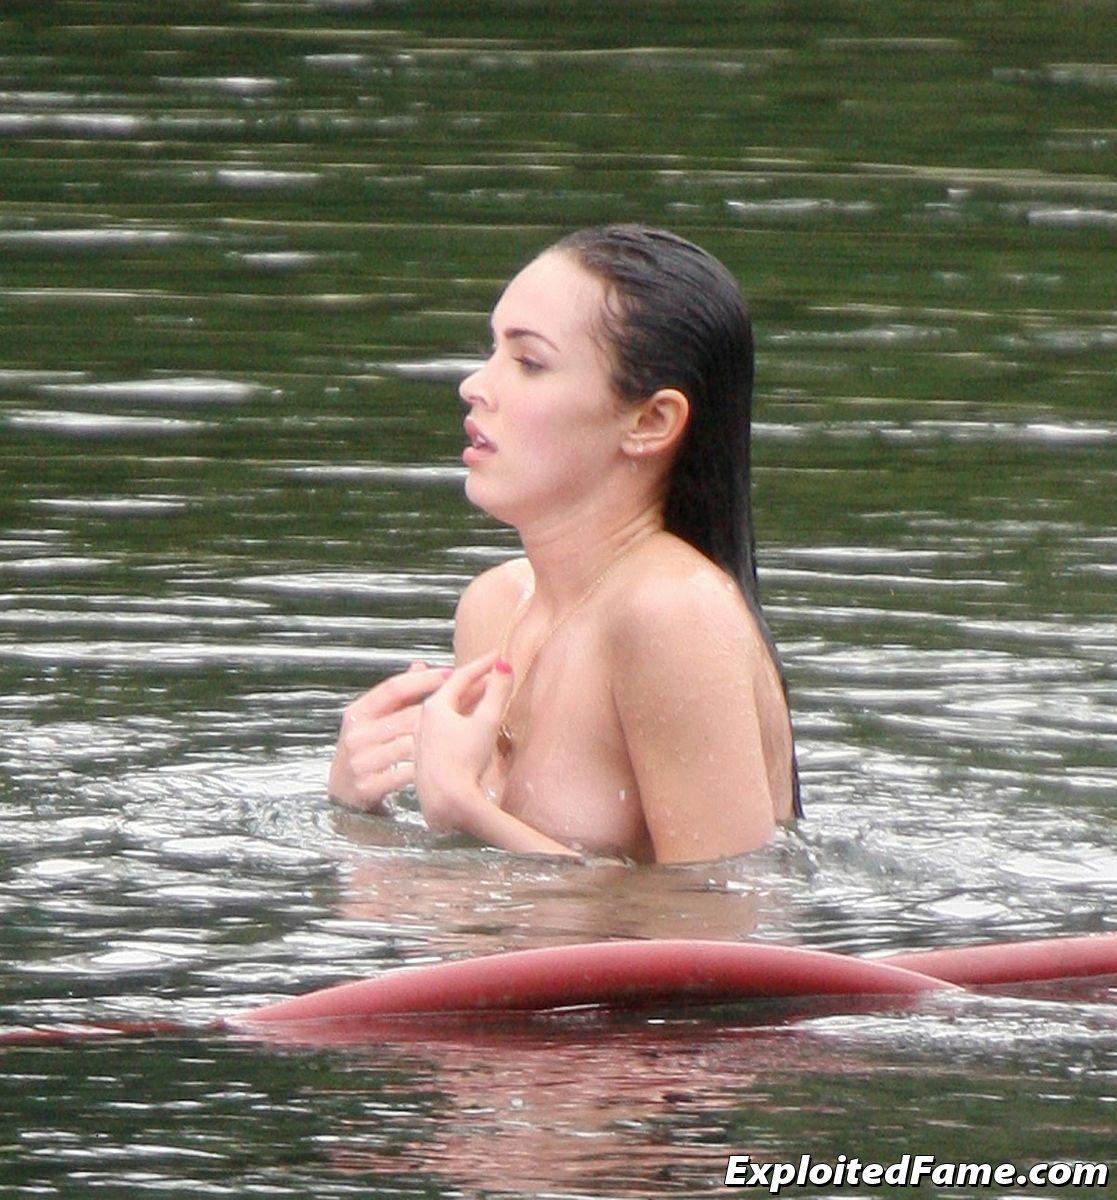 Midget pornstars bridget the midget creampie